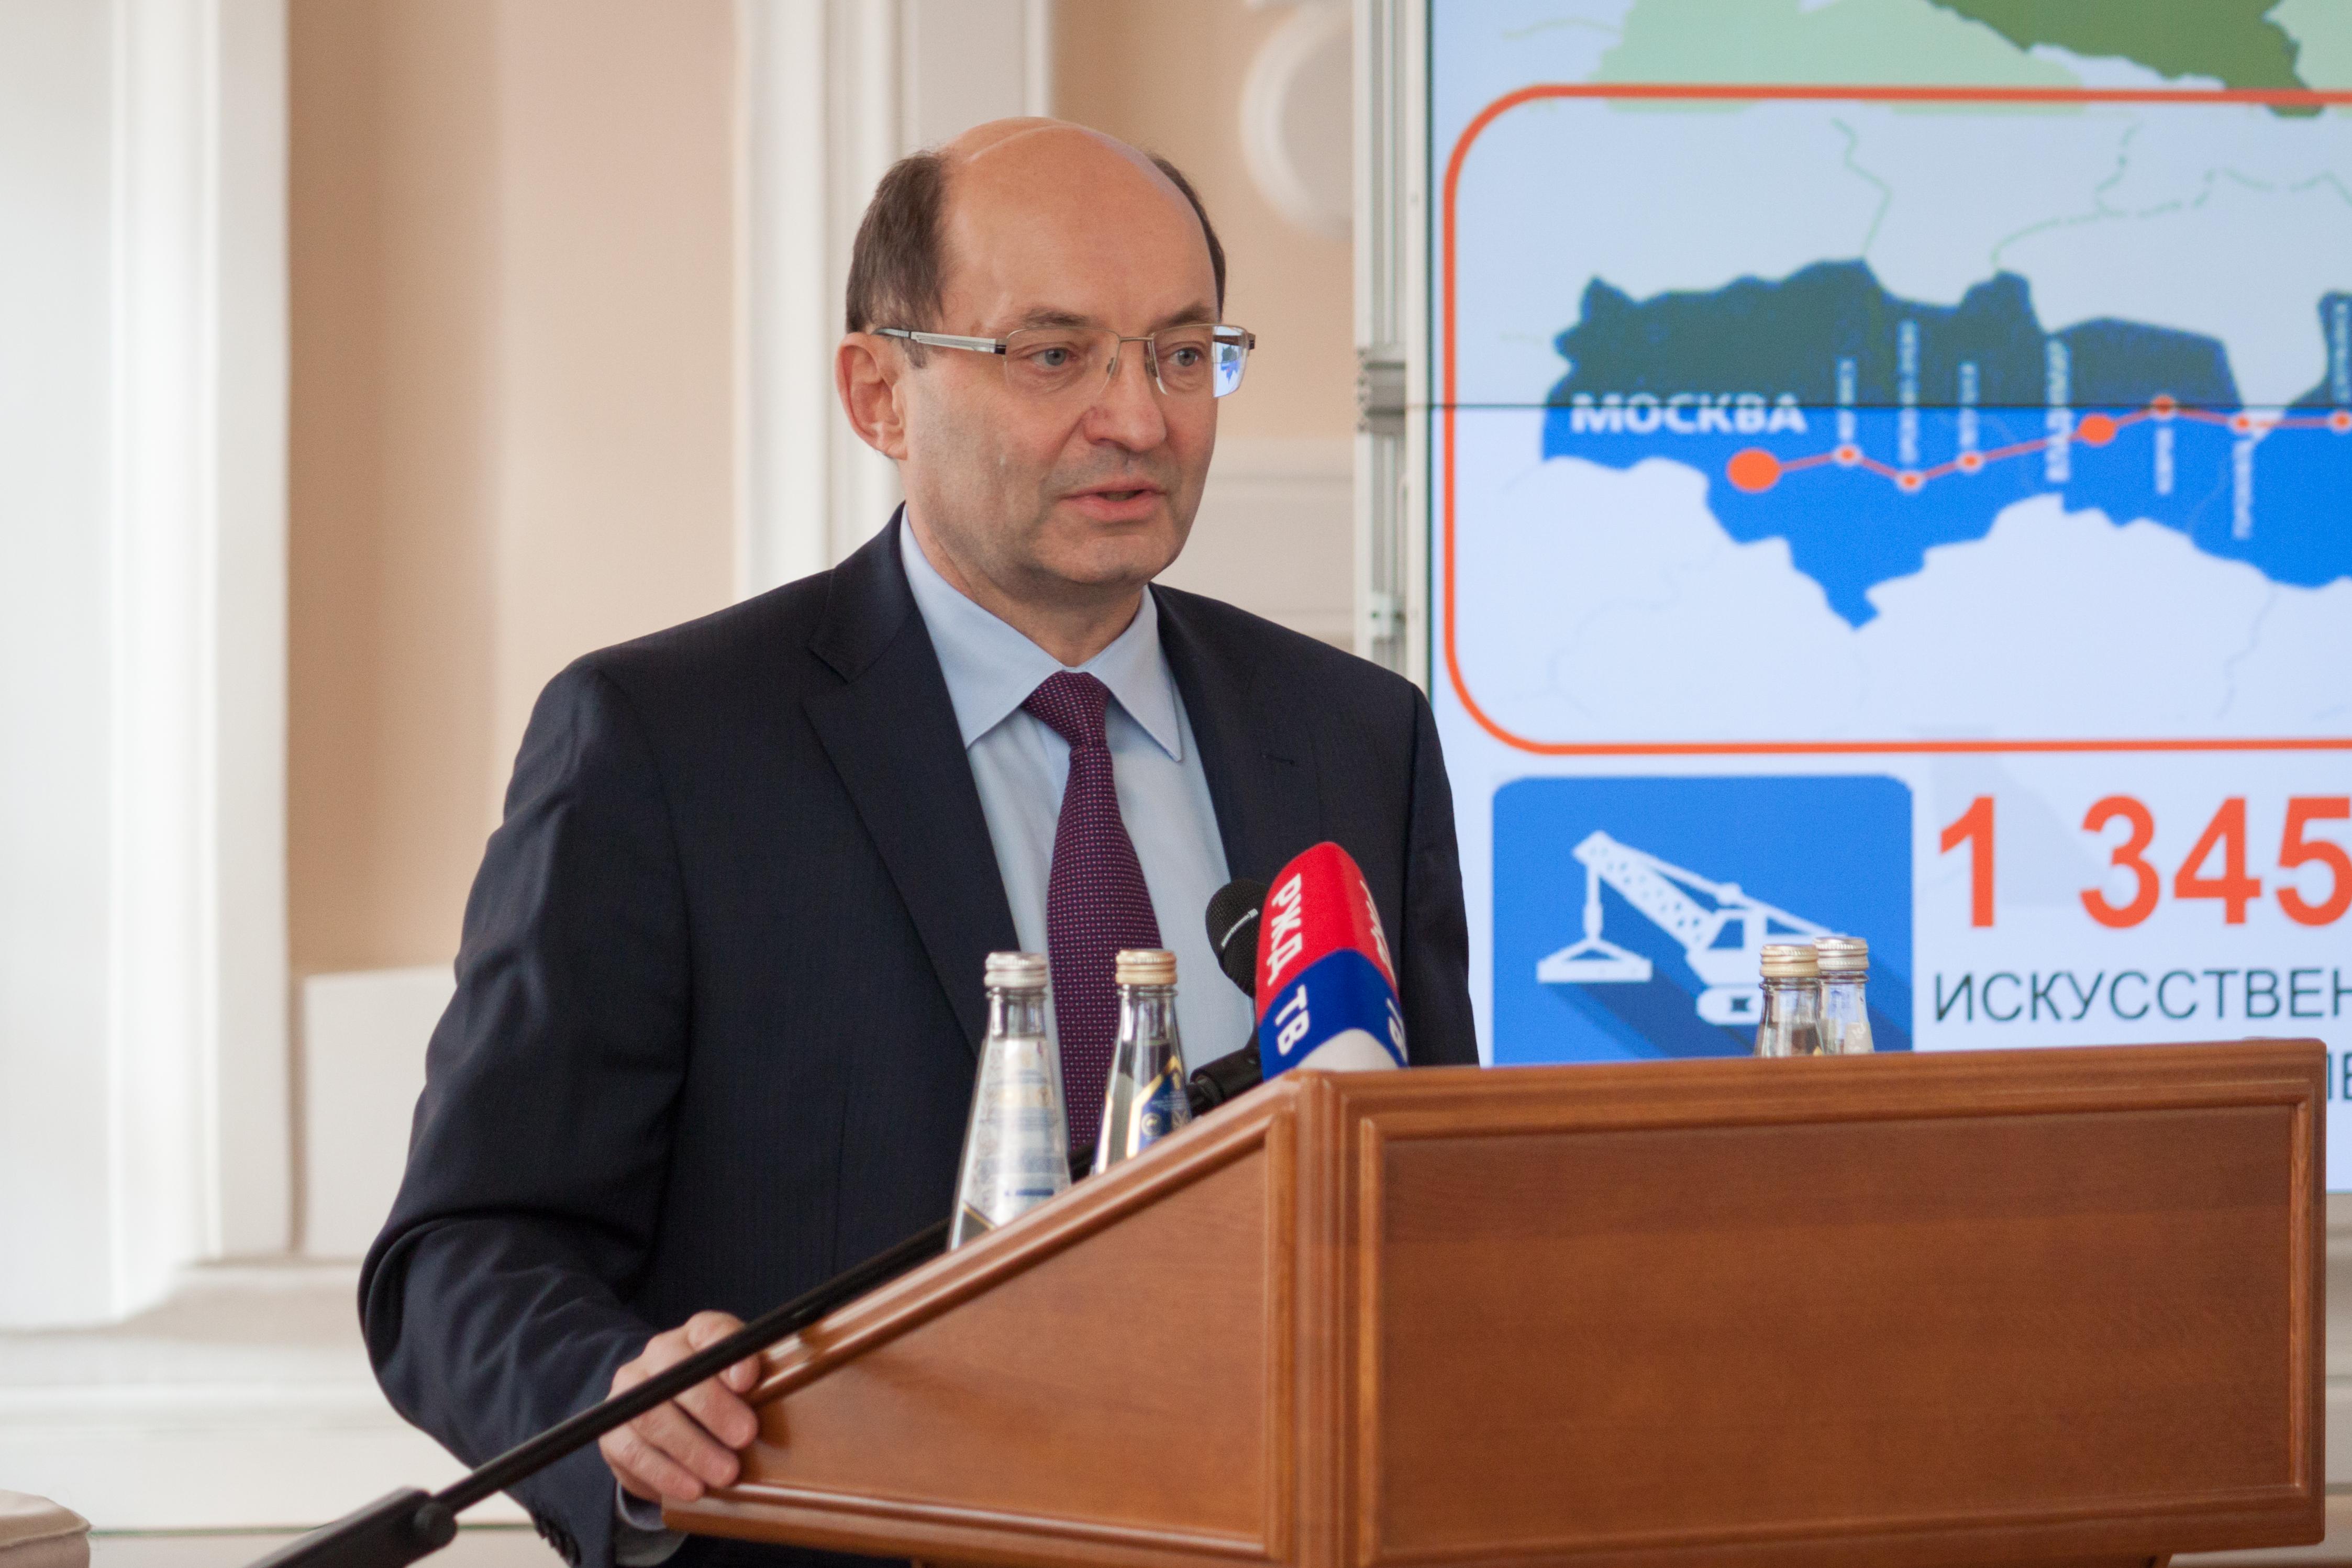 Aleksandr Misharin, vicepresidente delle Ferrovie russe.